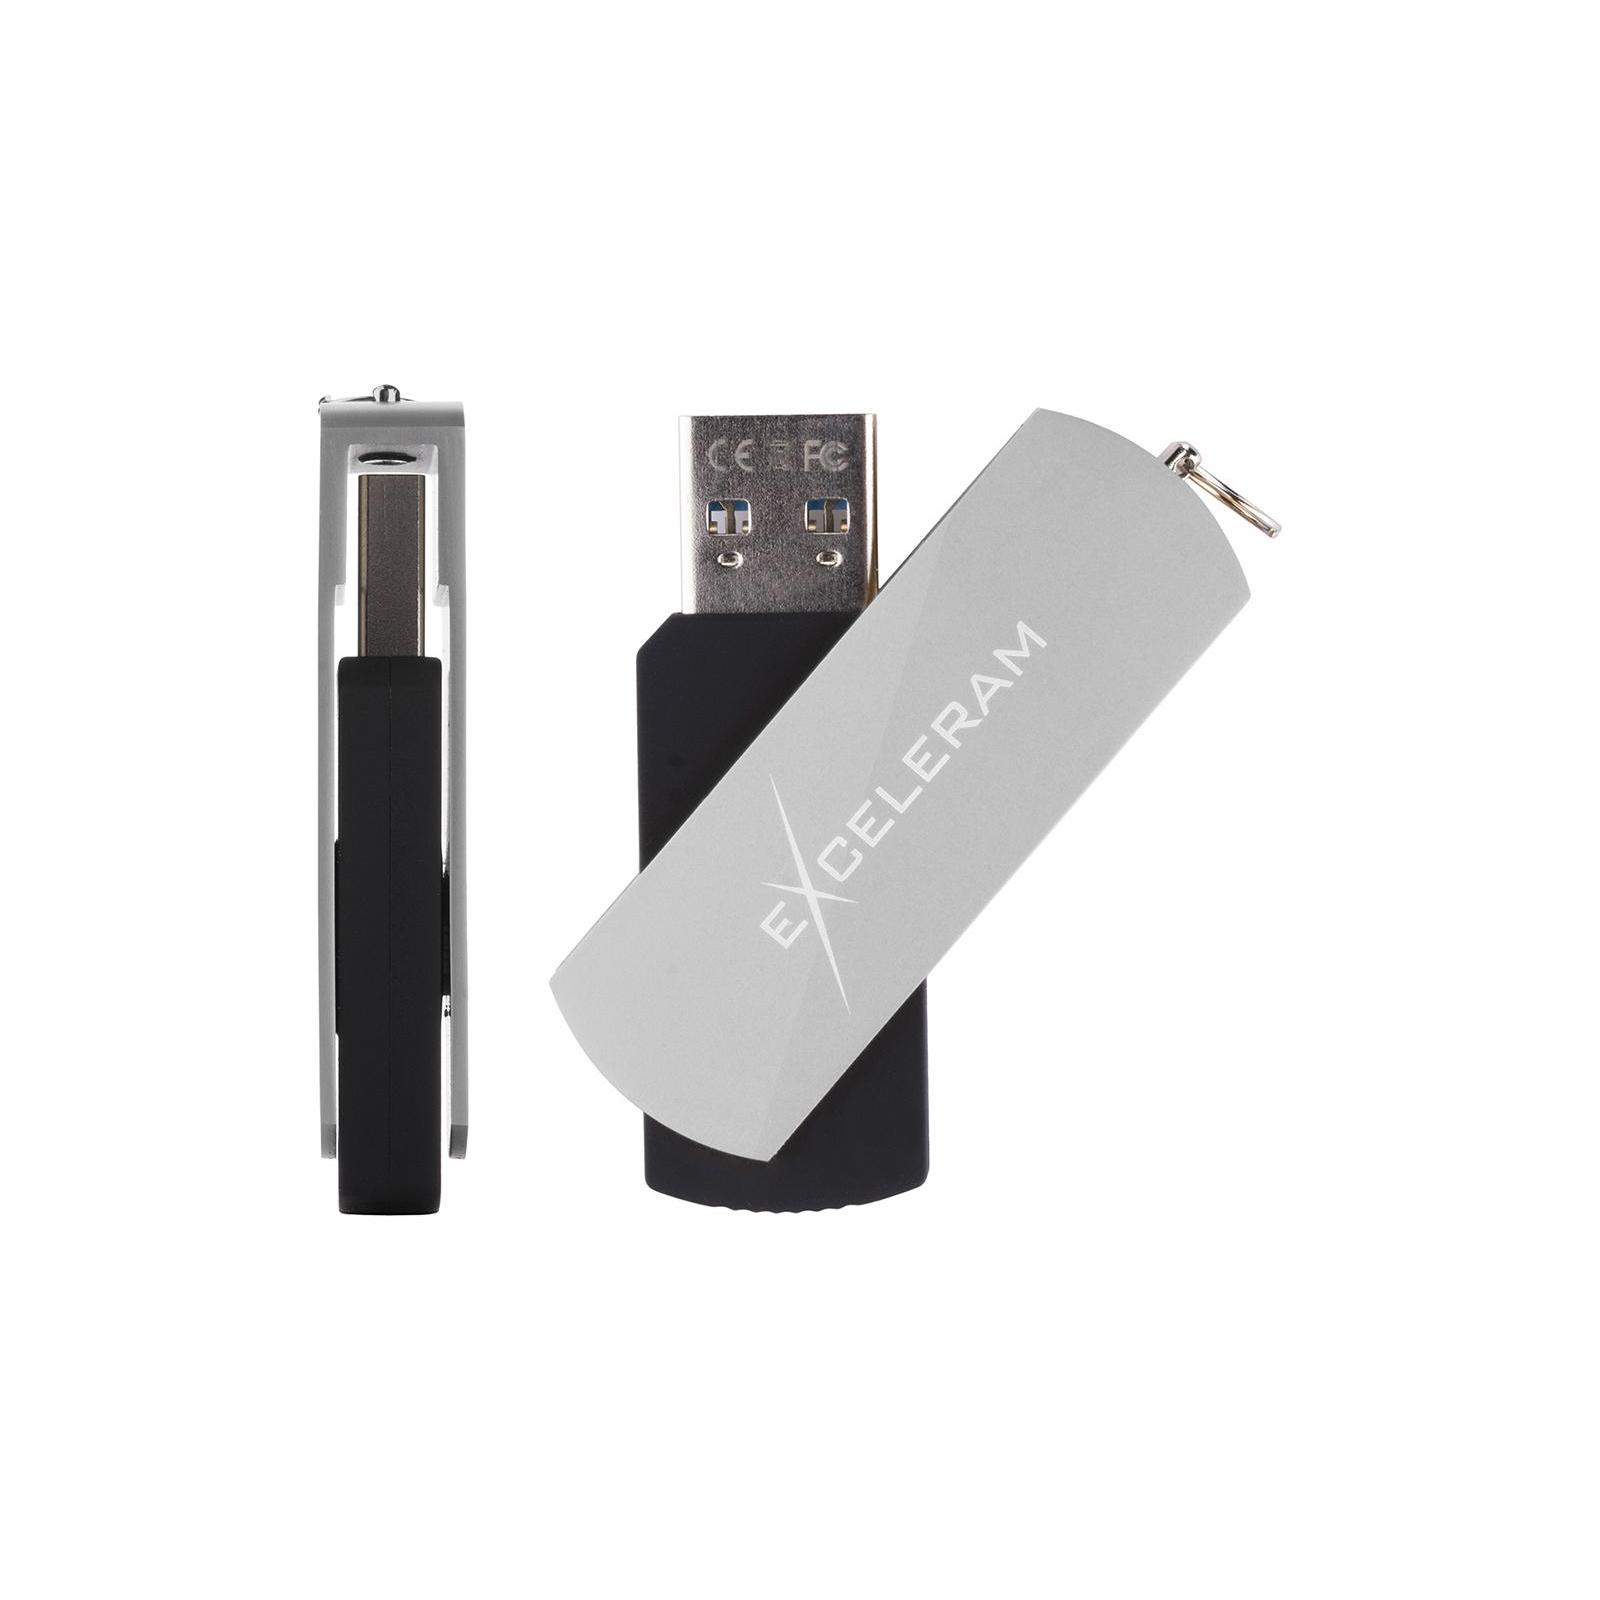 USB флеш накопитель eXceleram 128GB P2 Series Red/Black USB 3.1 Gen 1 (EXP2U3REB128) изображение 4